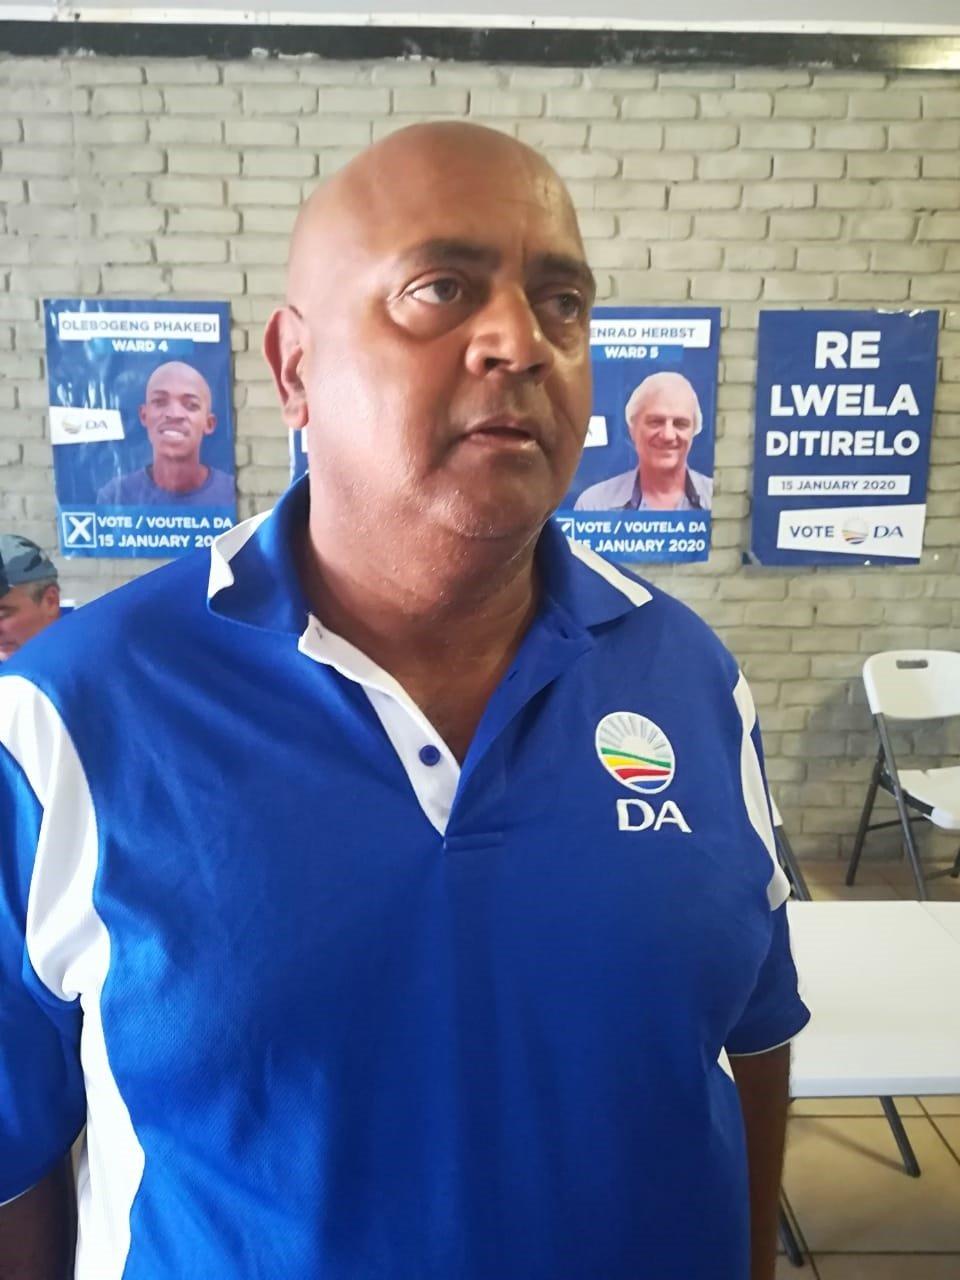 North West Provincial leader of DA Joe McGluwa. Ph